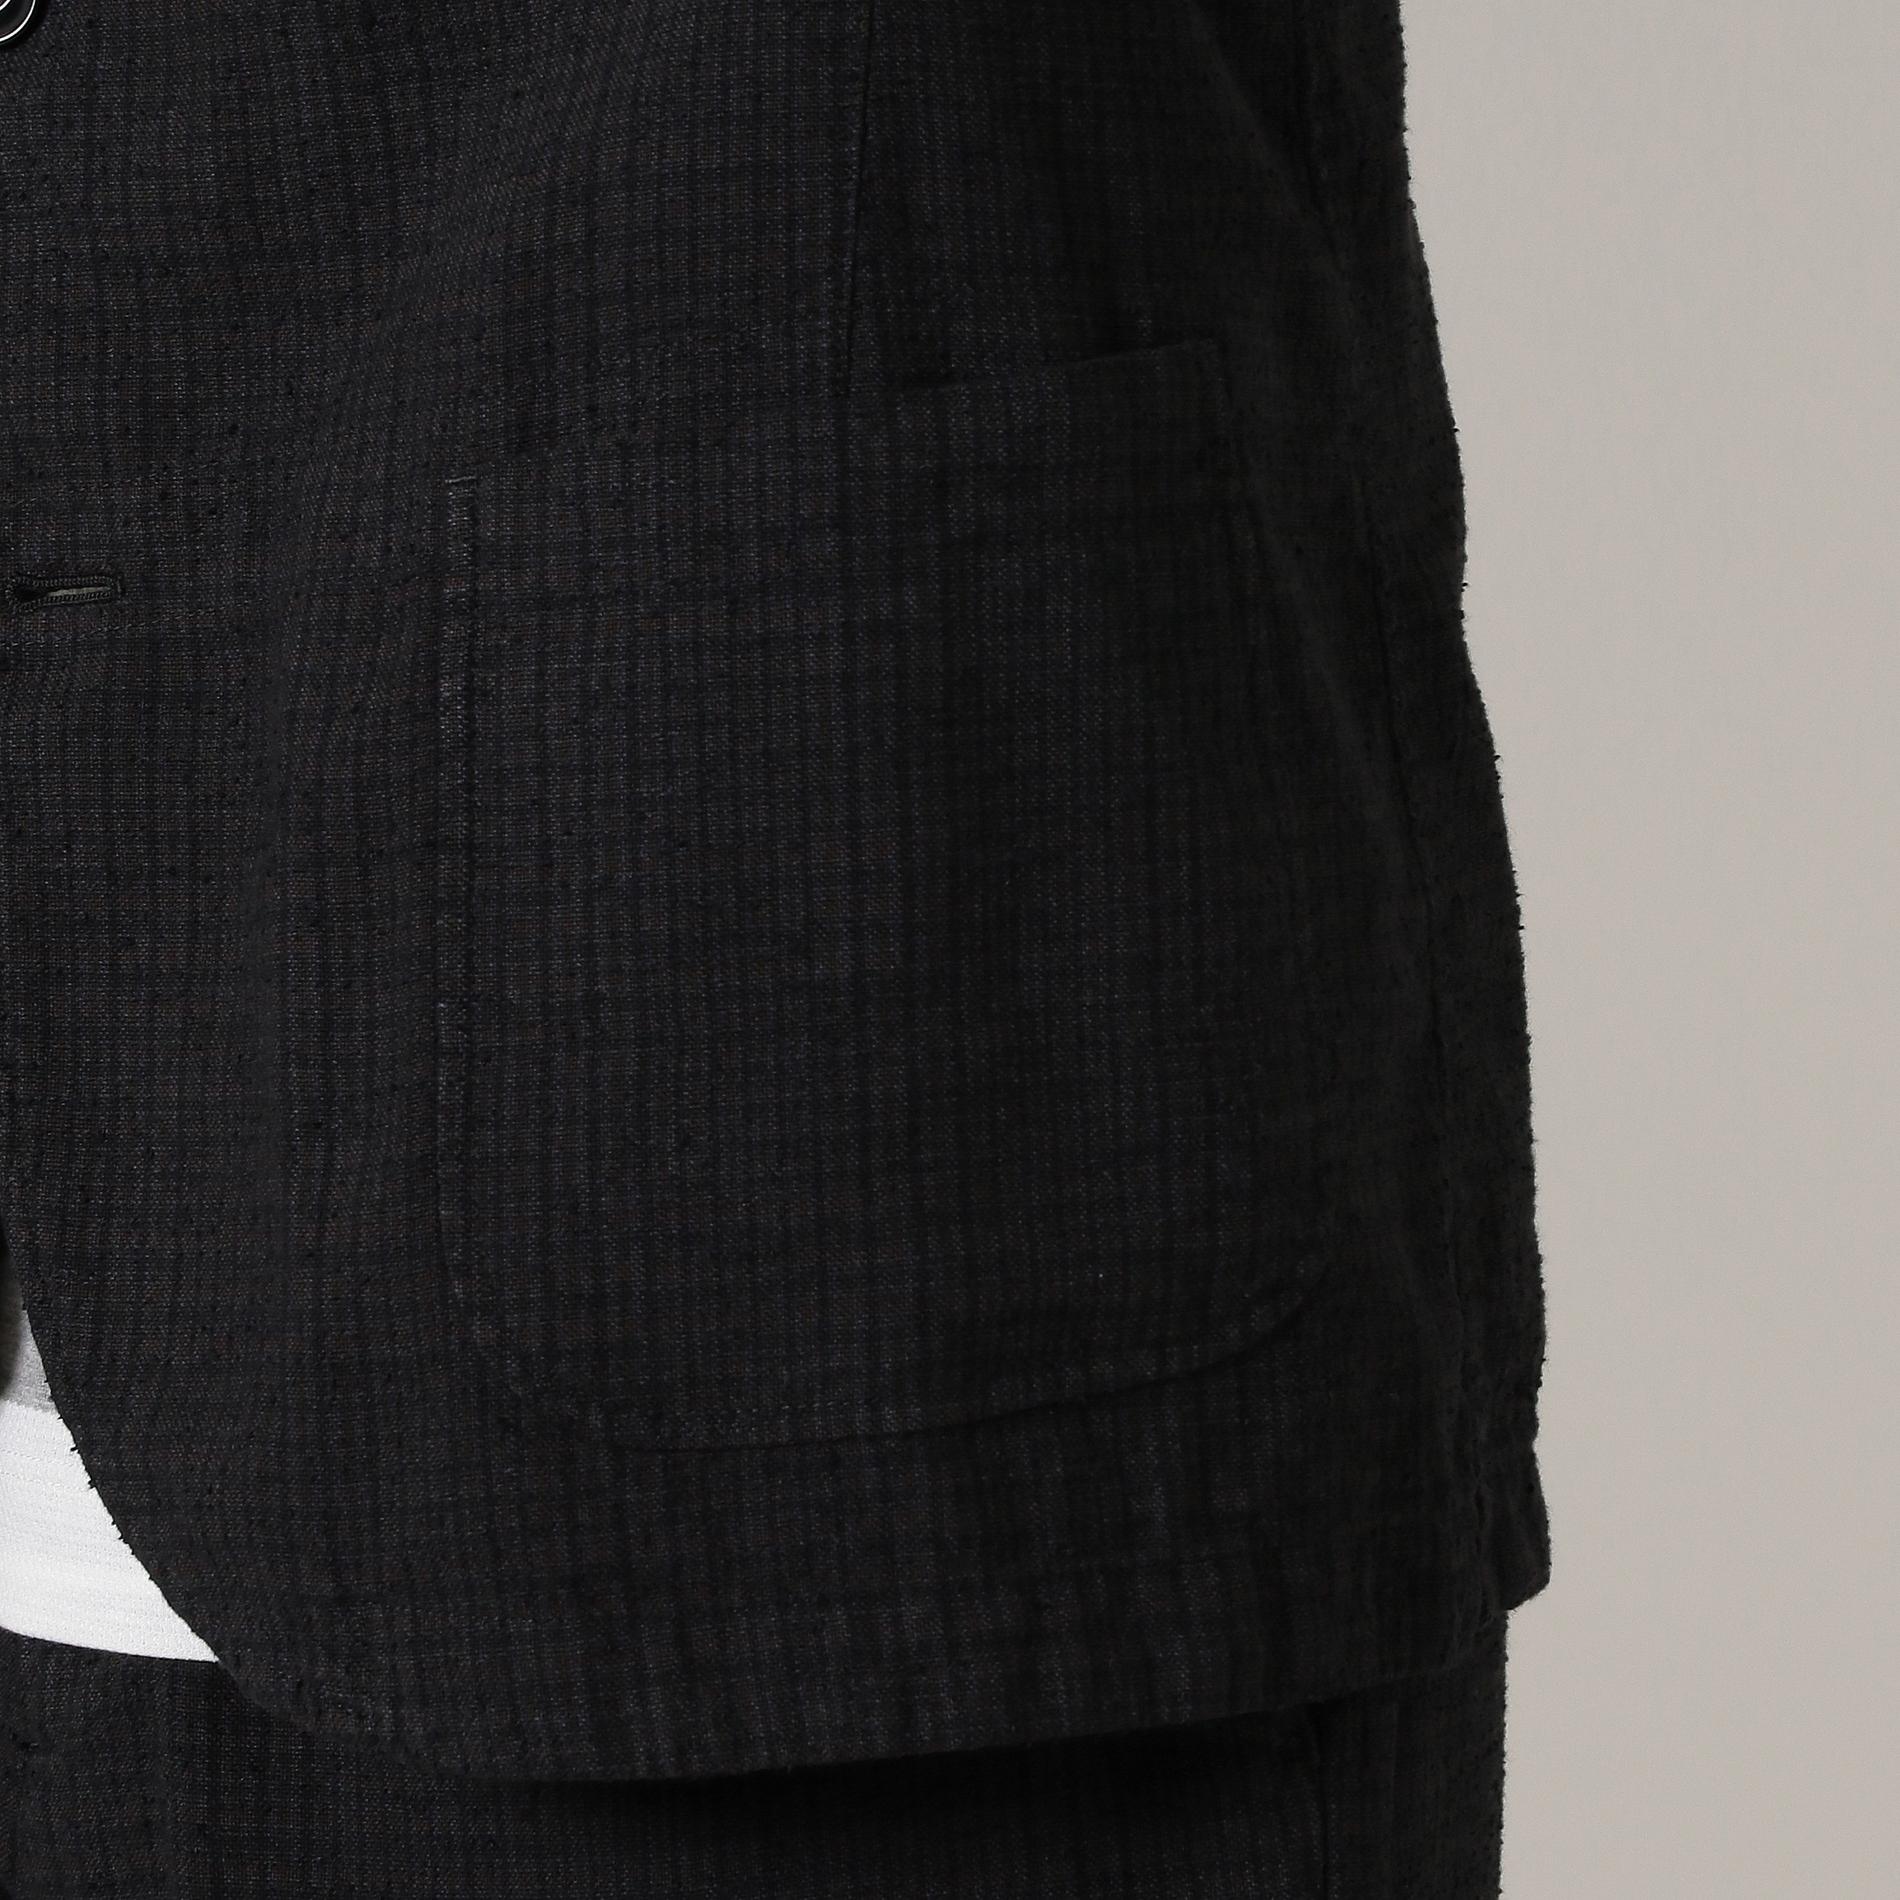 【LEON別注】【BOTTOLI】BENEZIAN TWEED フレンチワークジャケット